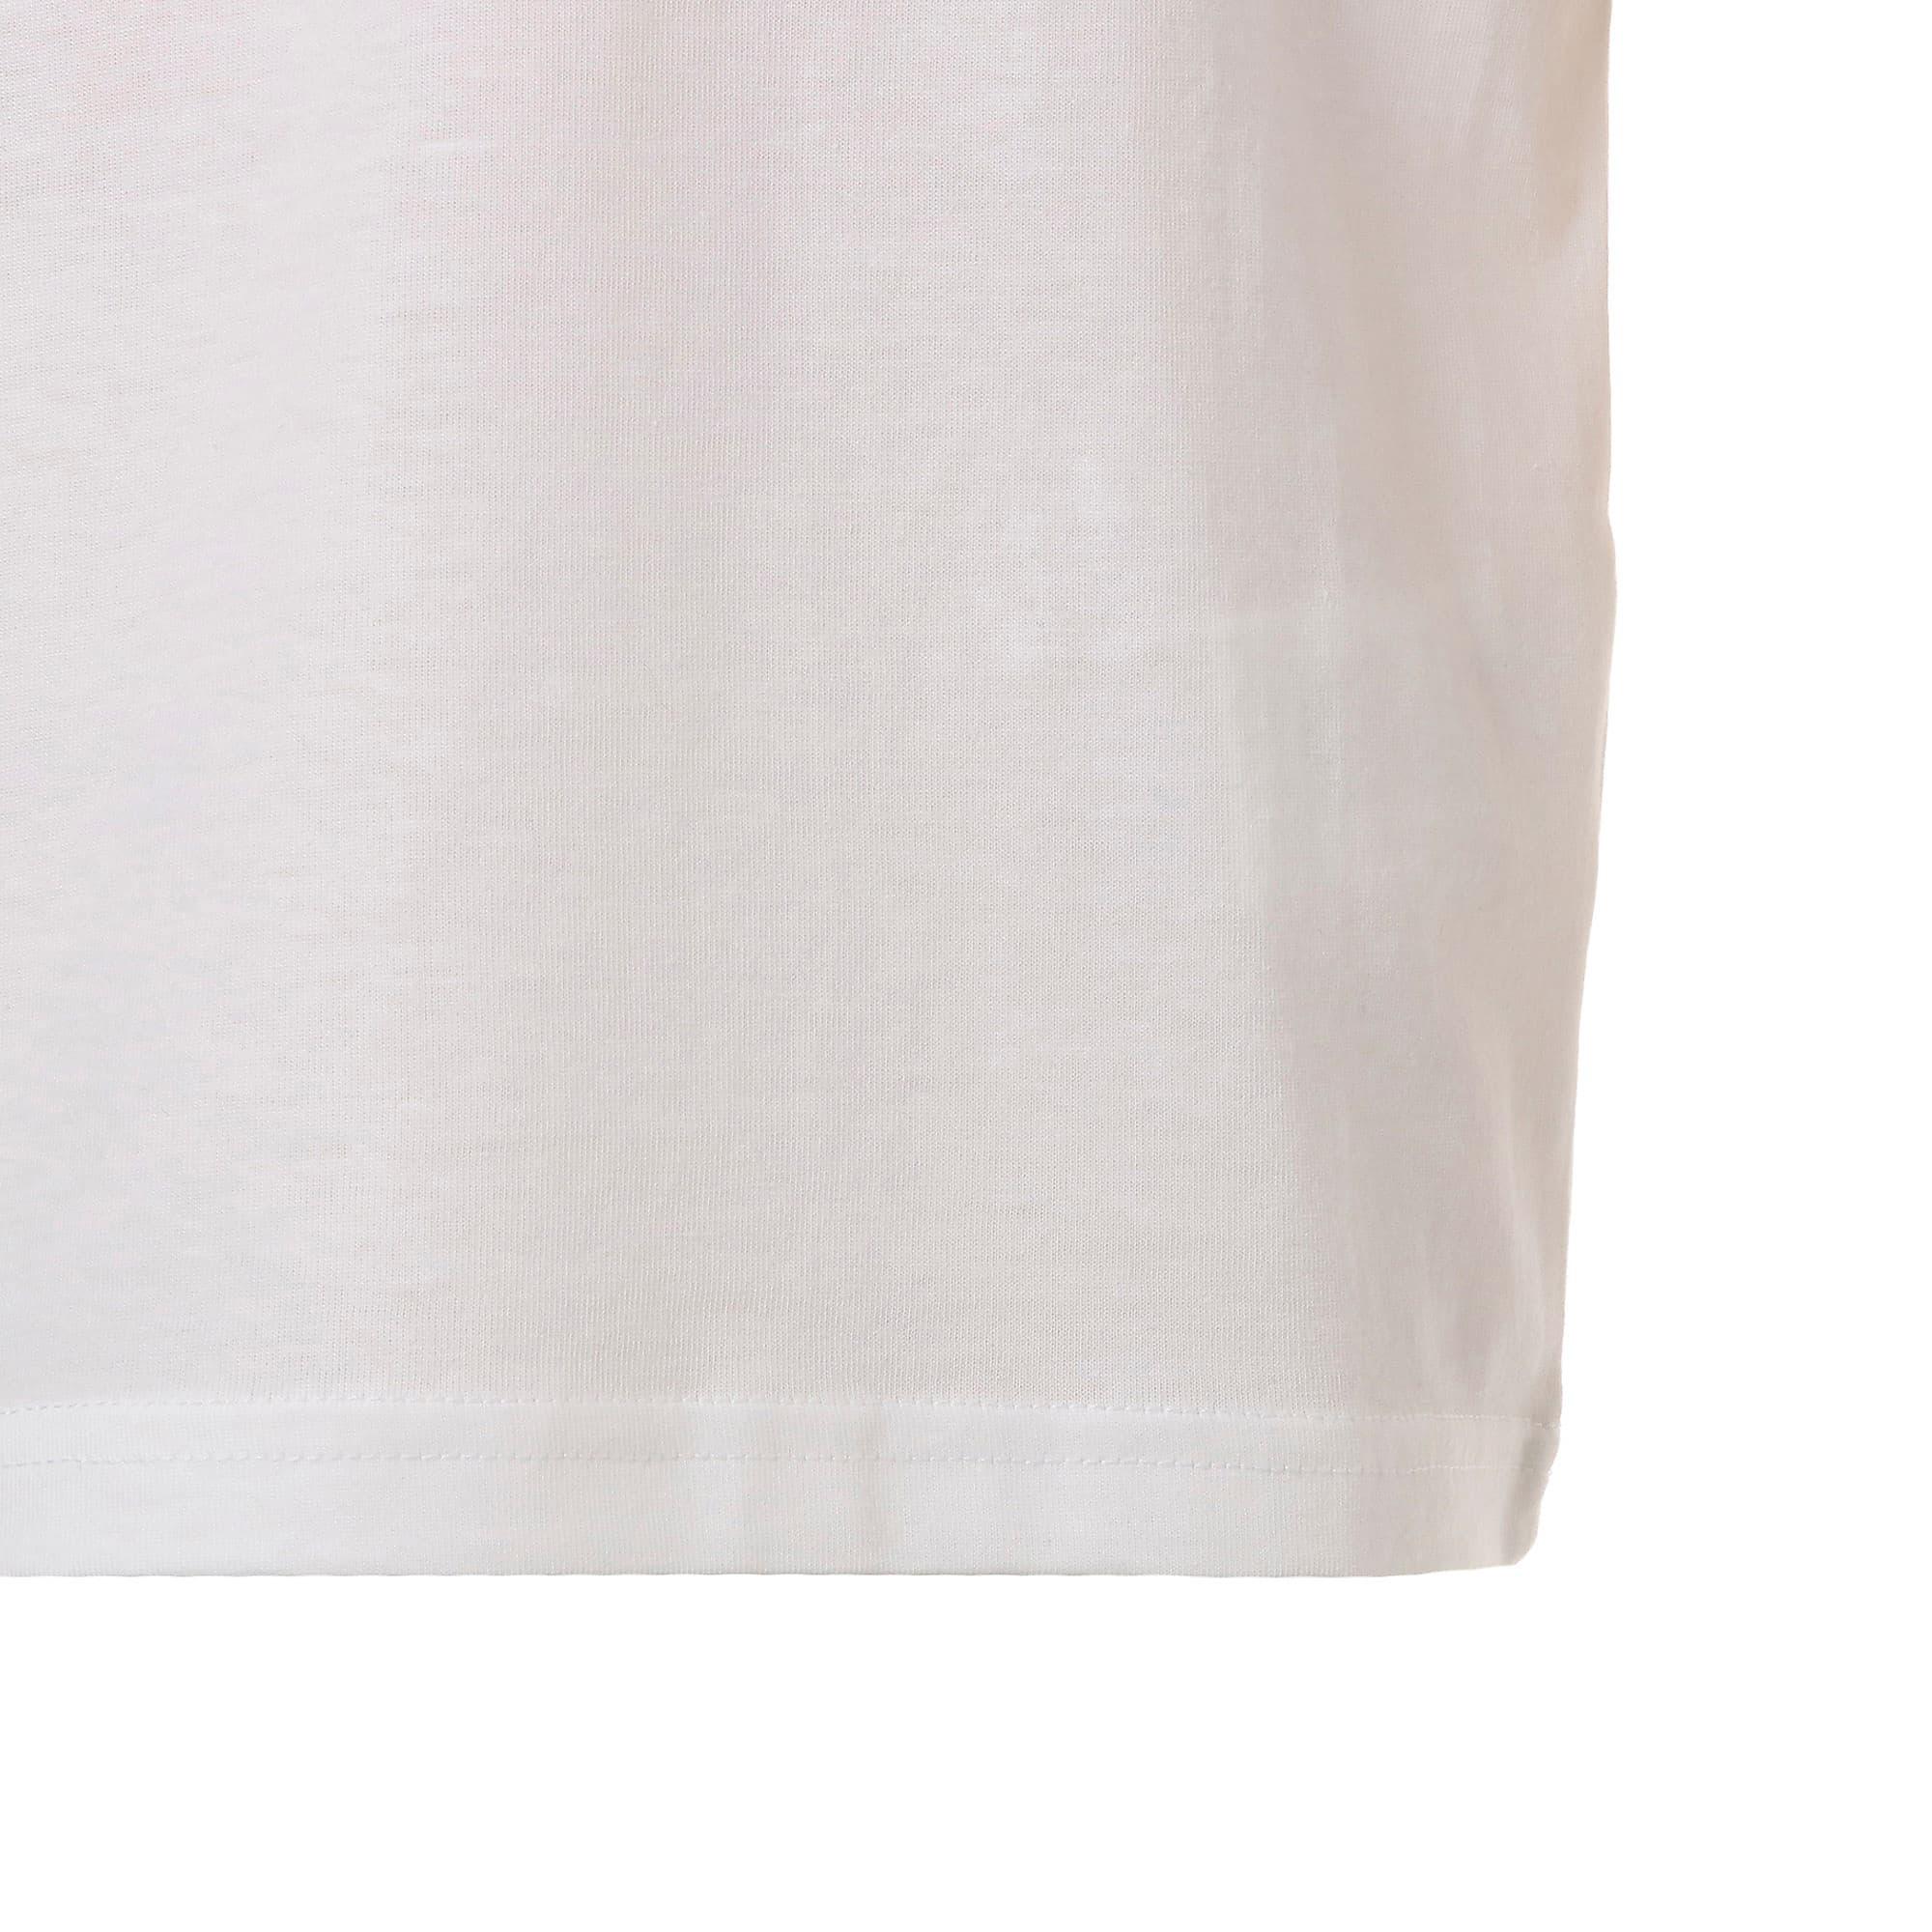 Thumbnail 6 of キッズ ALPHA SS トレンド Tシャツ 半袖, Puma White, medium-JPN